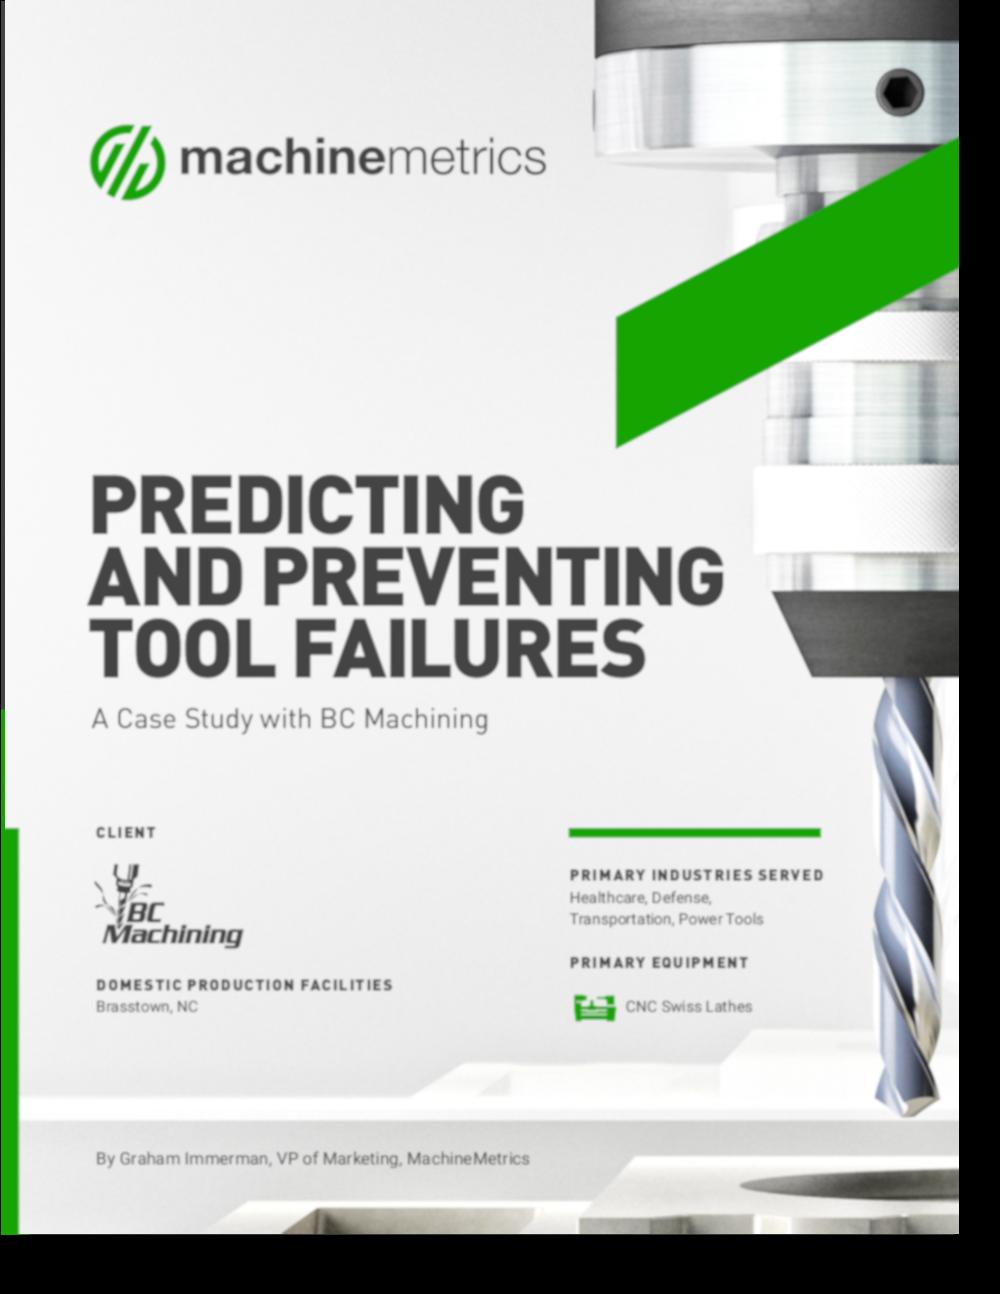 bc machining short form case study meta image